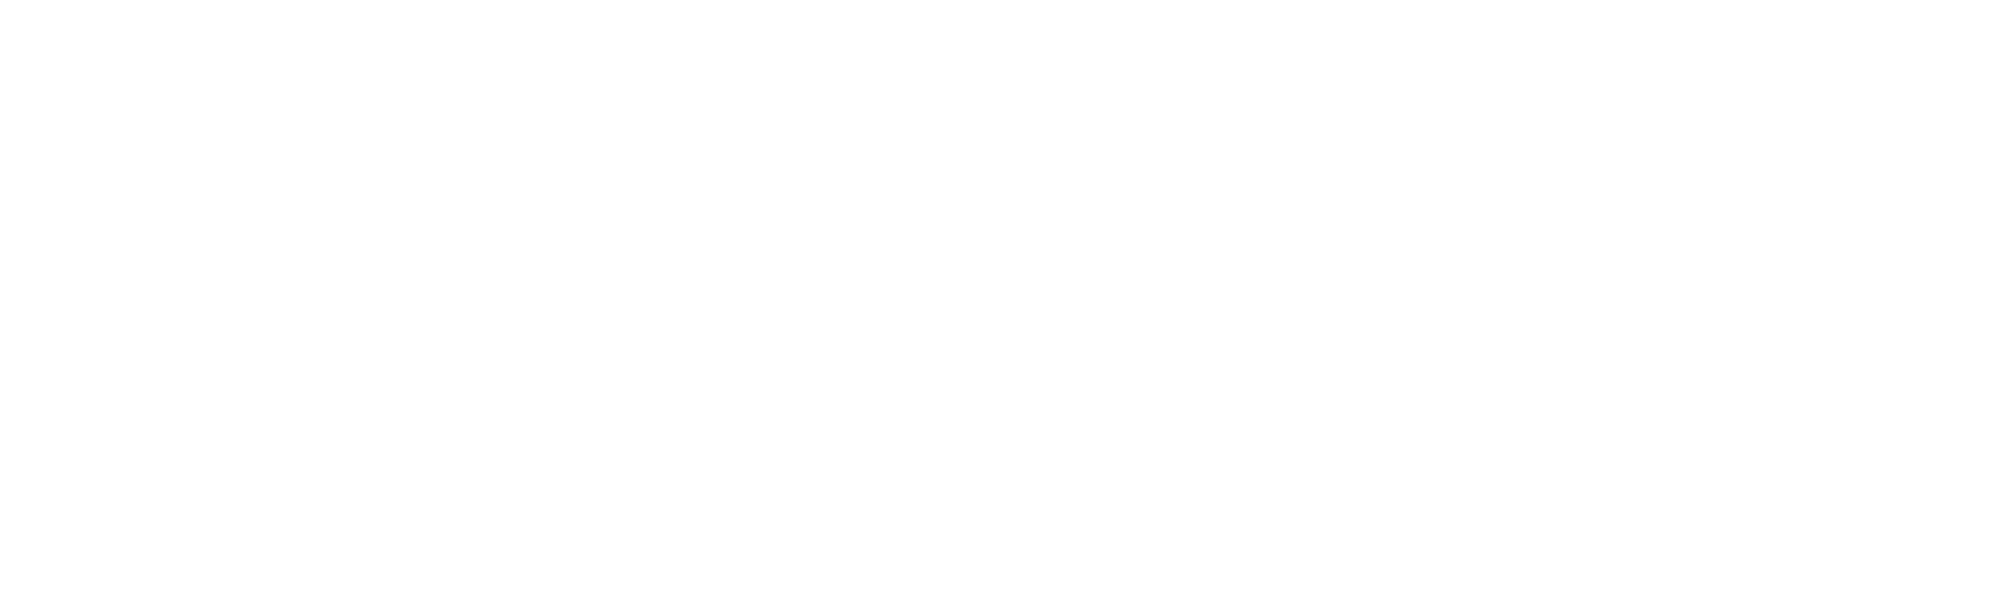 banner-blank3